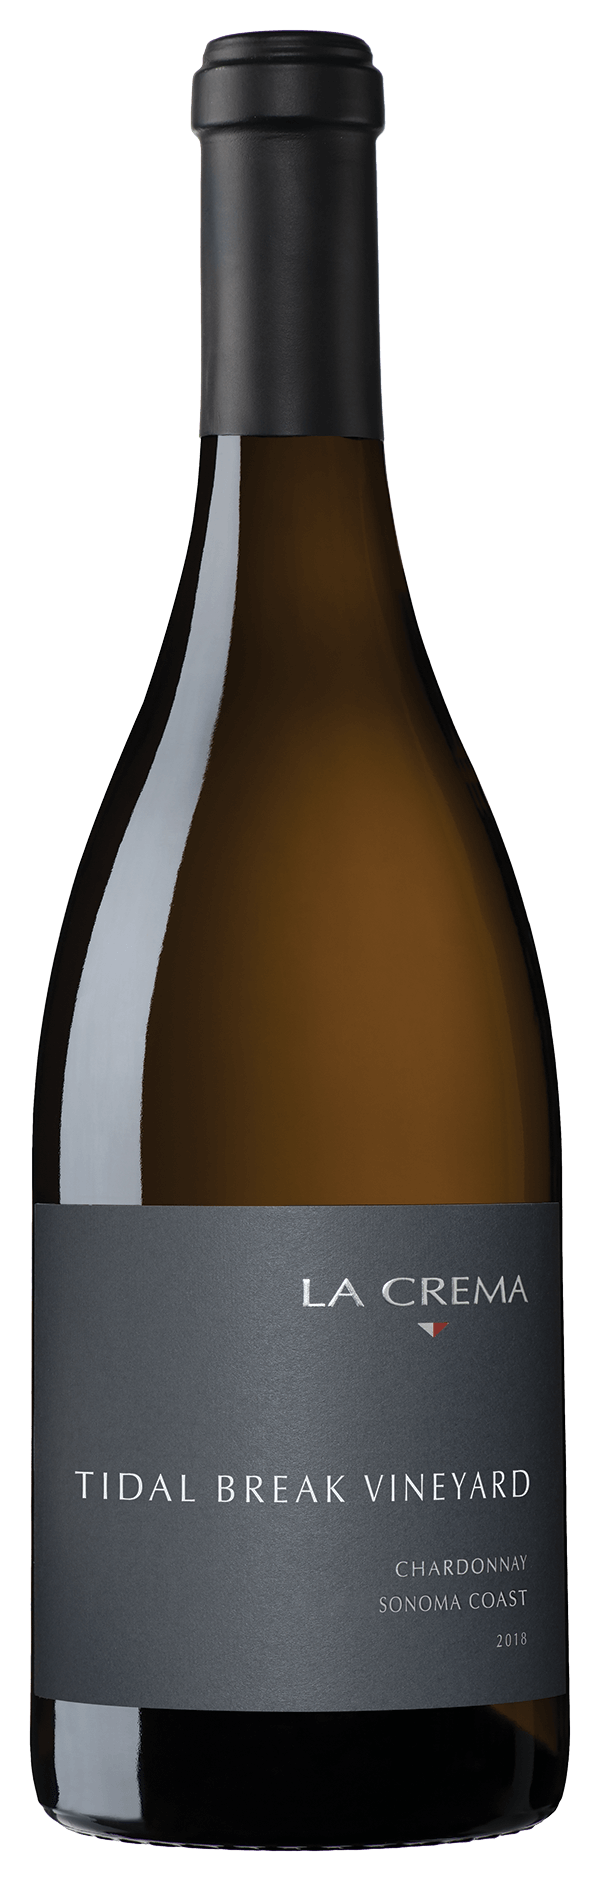 2018 Tidal Break Vineyard Chardonnay